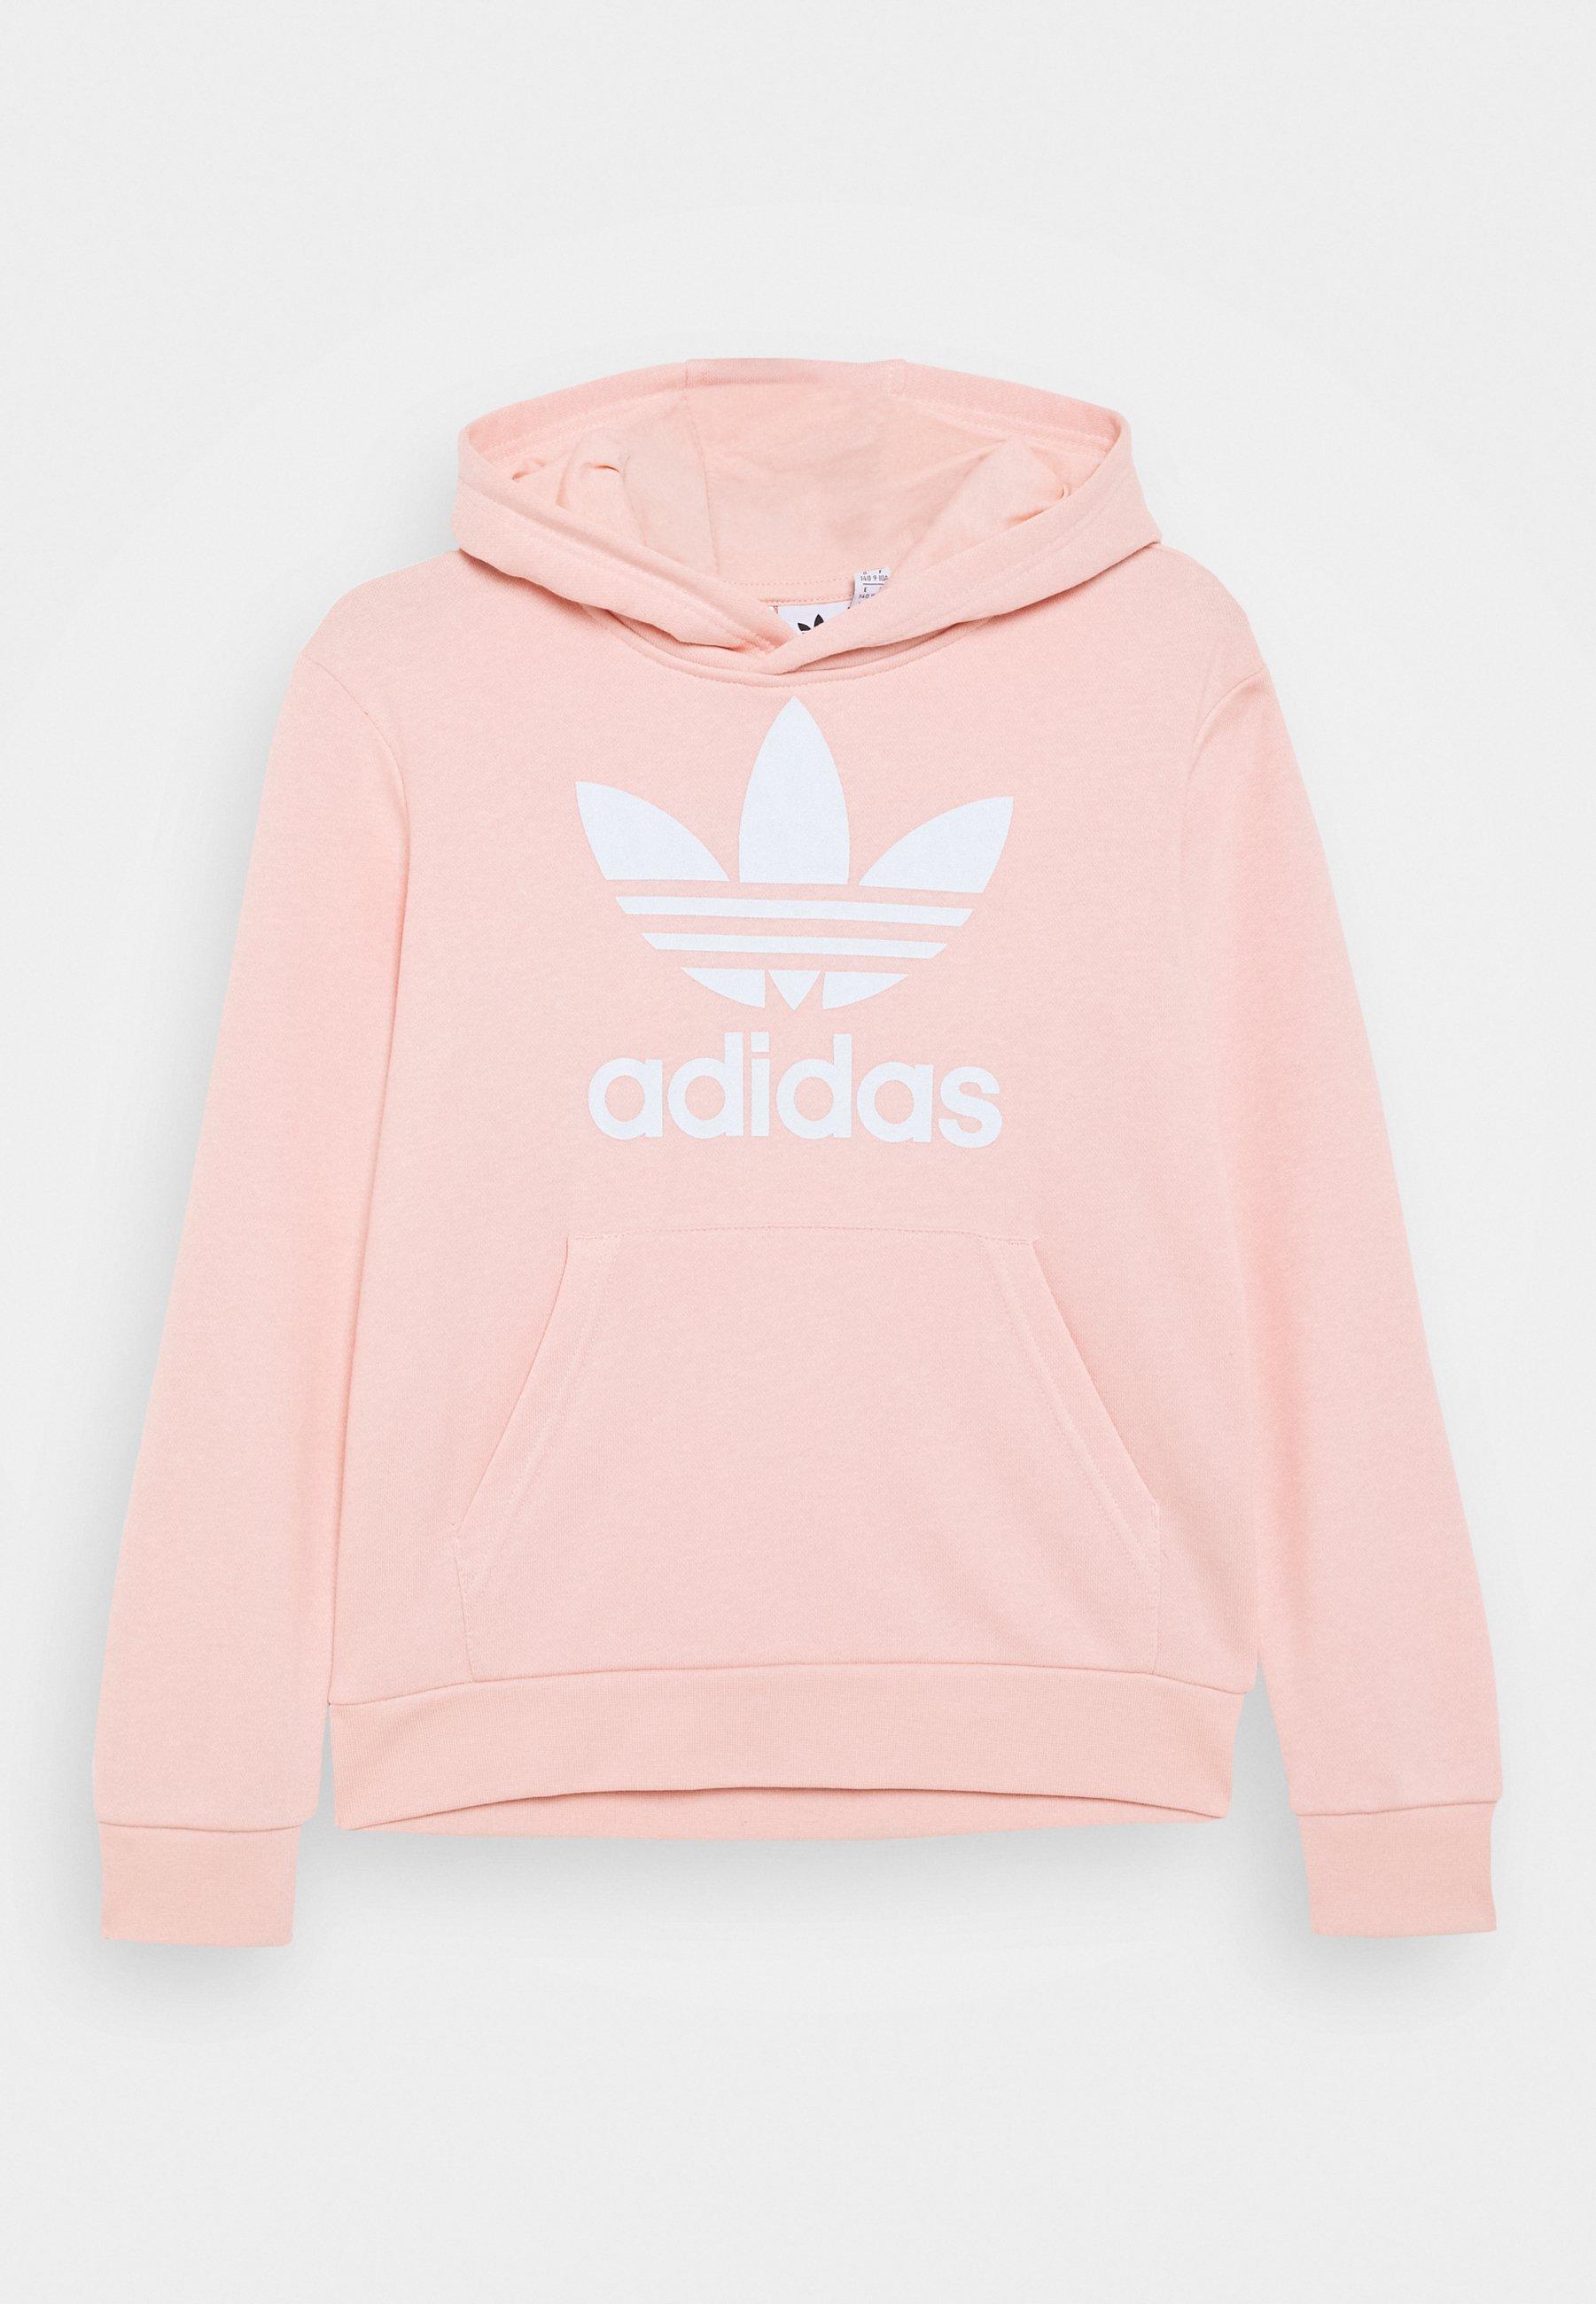 Facturable Cuota Relativo  adidas Originals TREFOIL HOODIE UNISEX - Hoodie - haze coral/white/light  pink - Zalando.co.uk